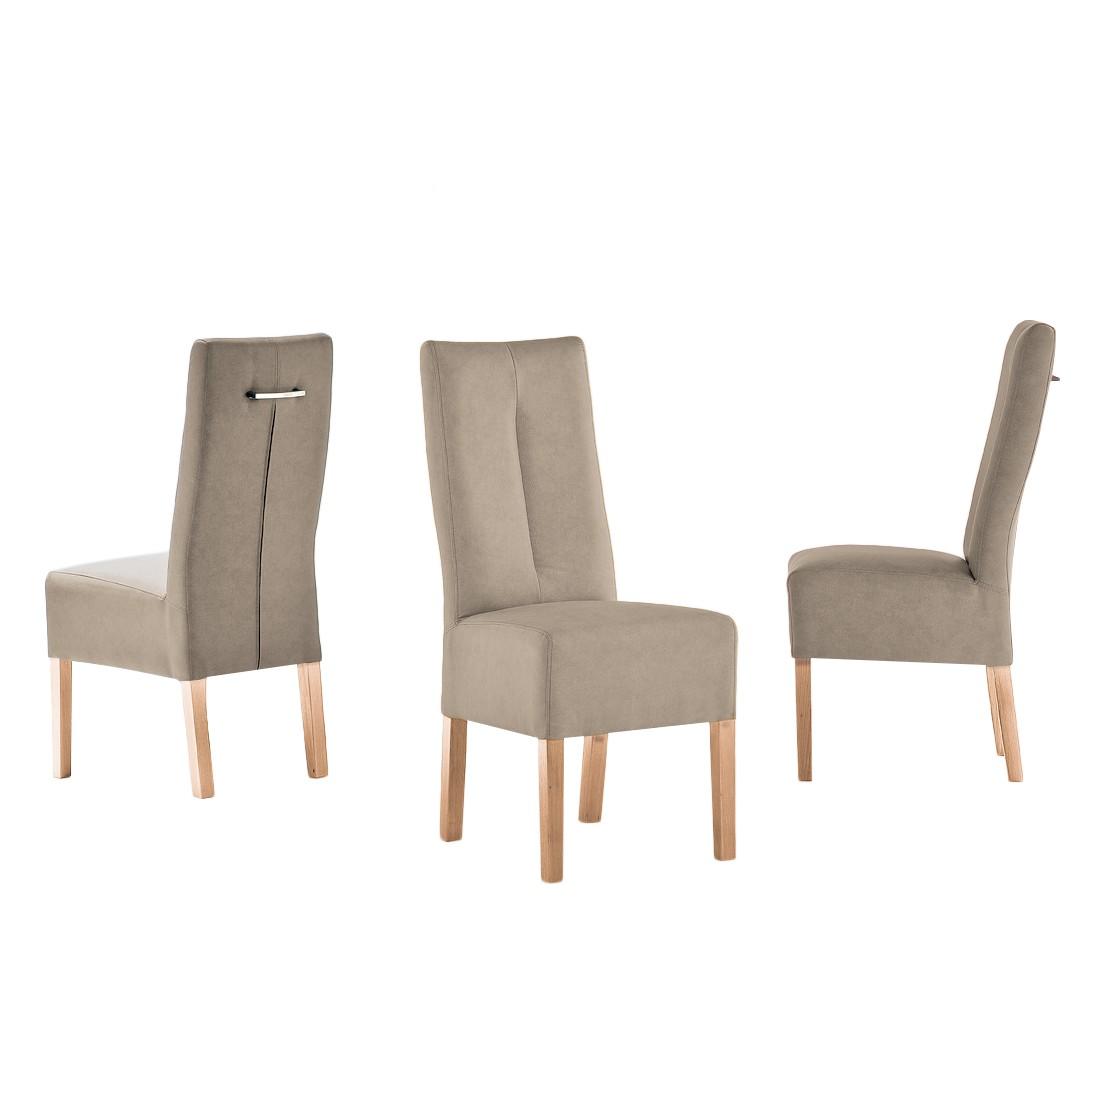 Gestoffeerde stoelen Funny II (2-delige set) - kunstleer - Taupe/beukenhout, Fredriks